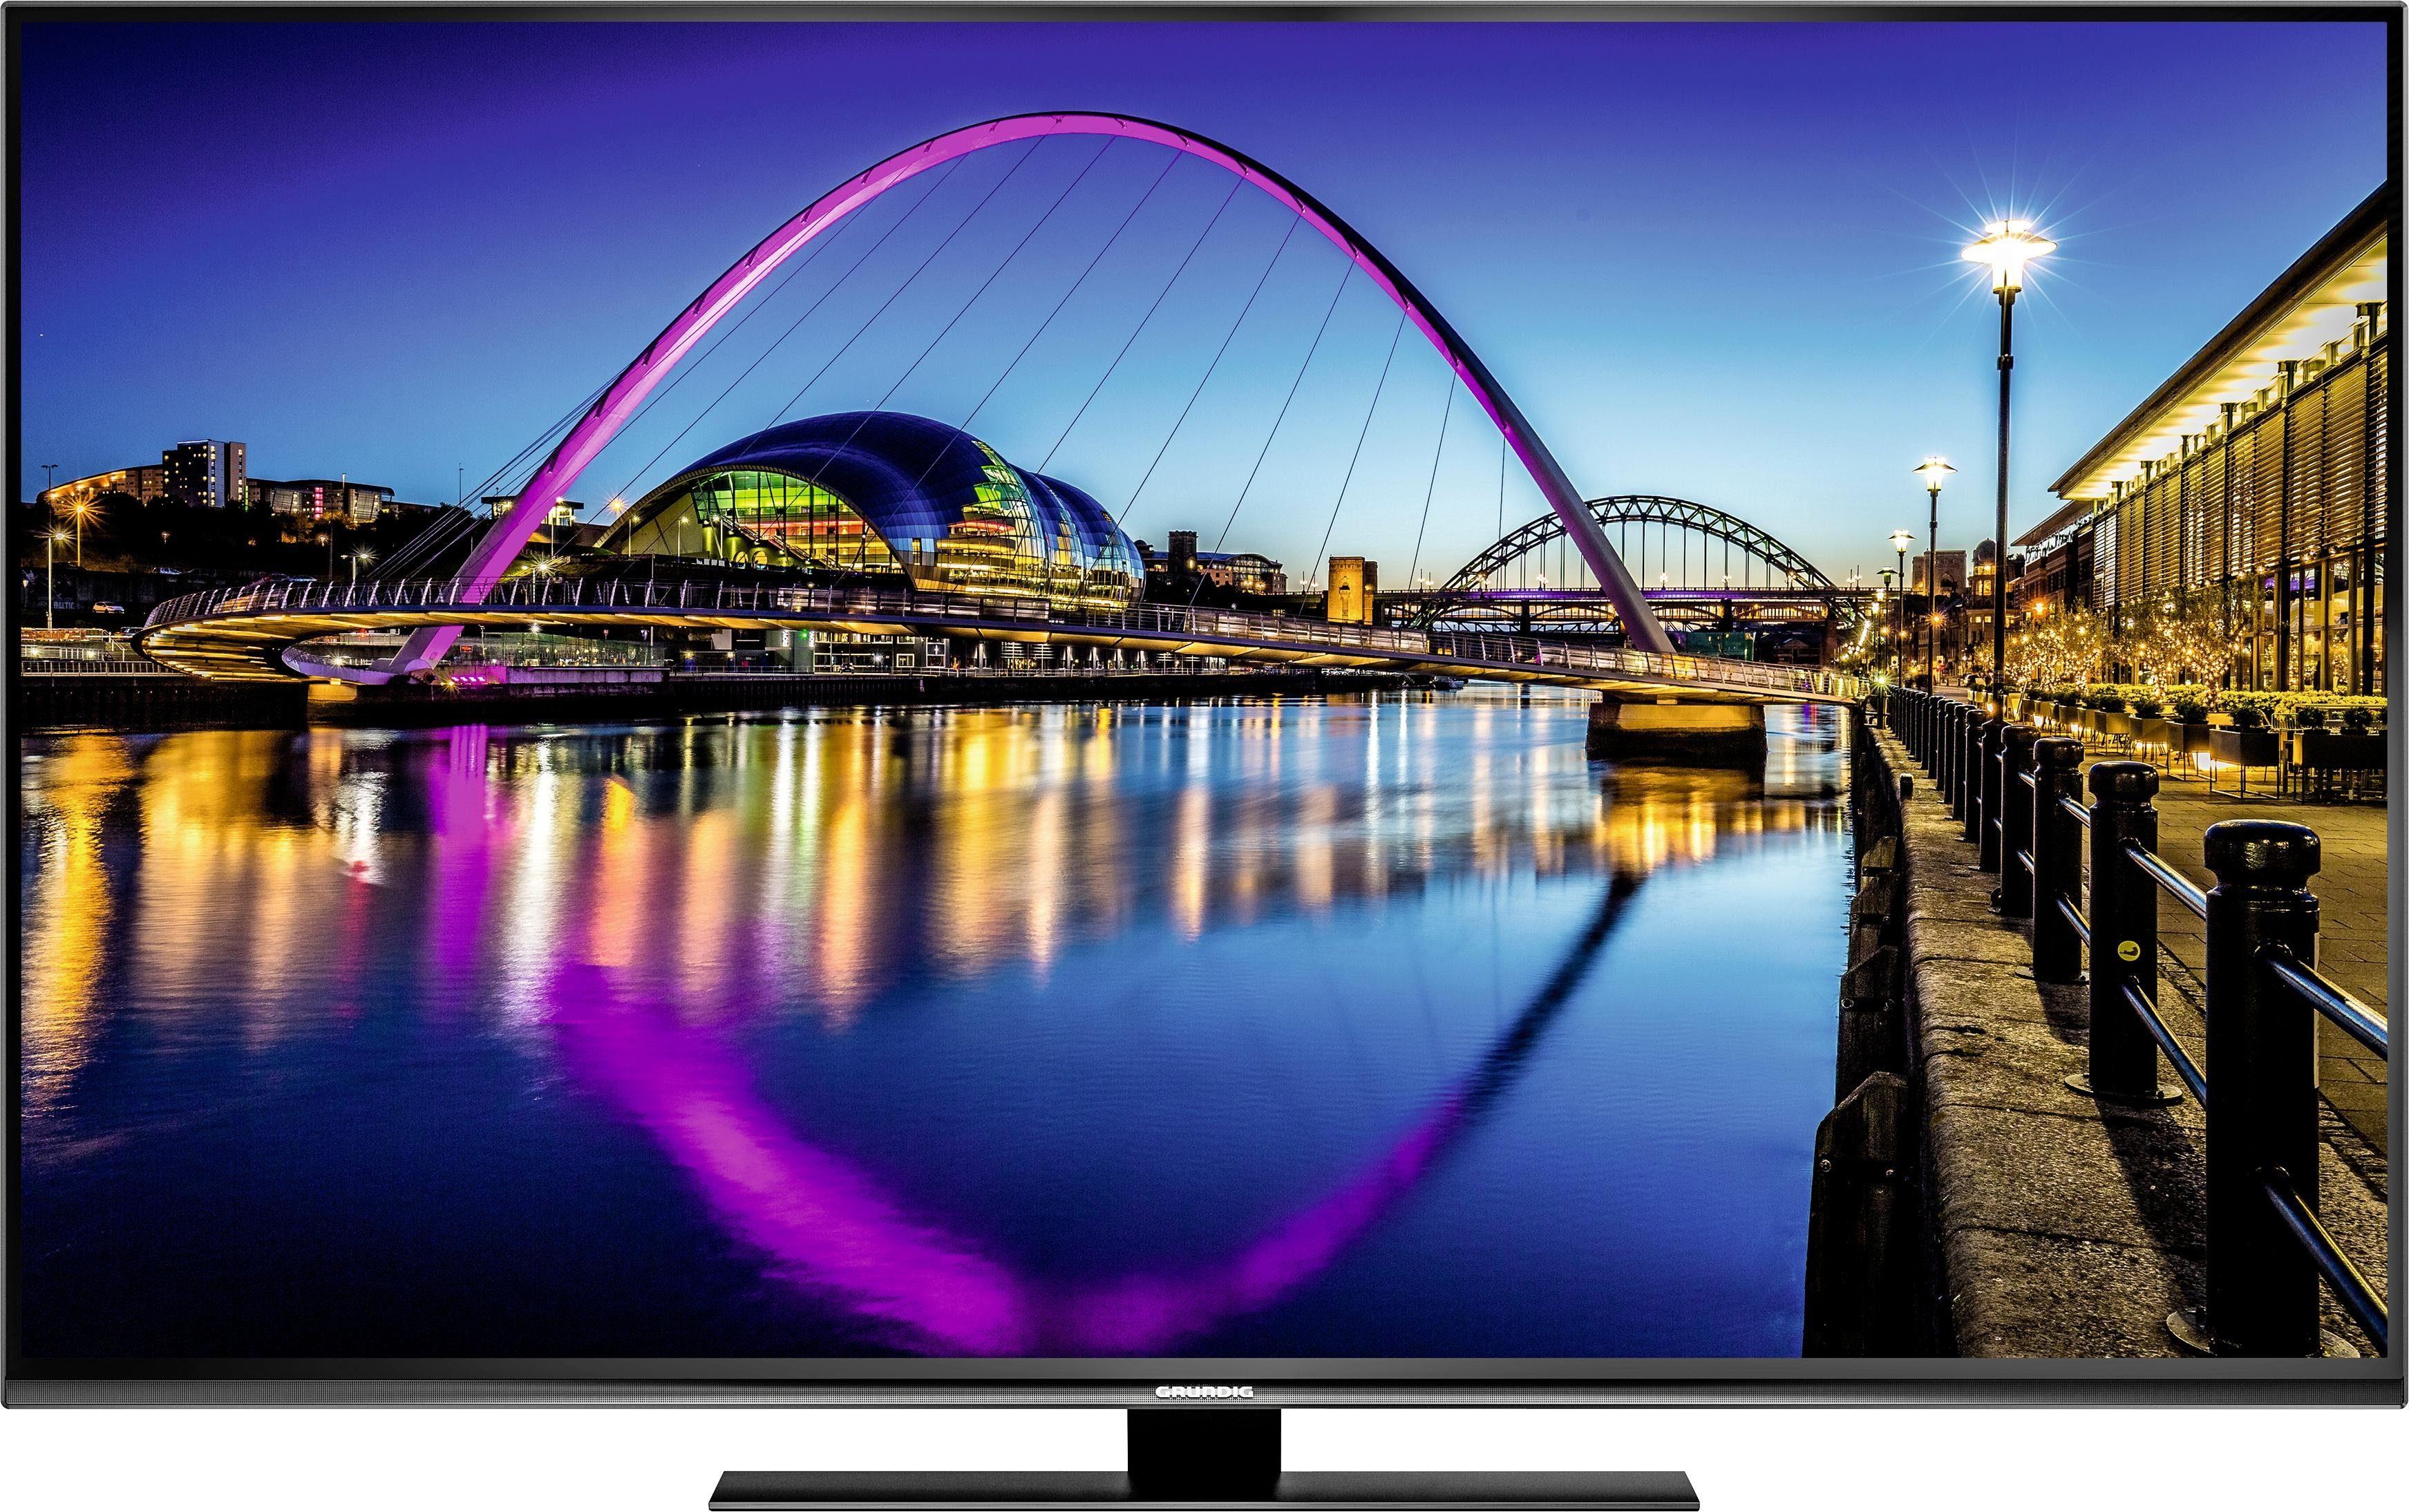 Grundig 49 GUB 9890 LED-Fernseher (49 Zoll, 4K Ultra HD, Smart-TV)